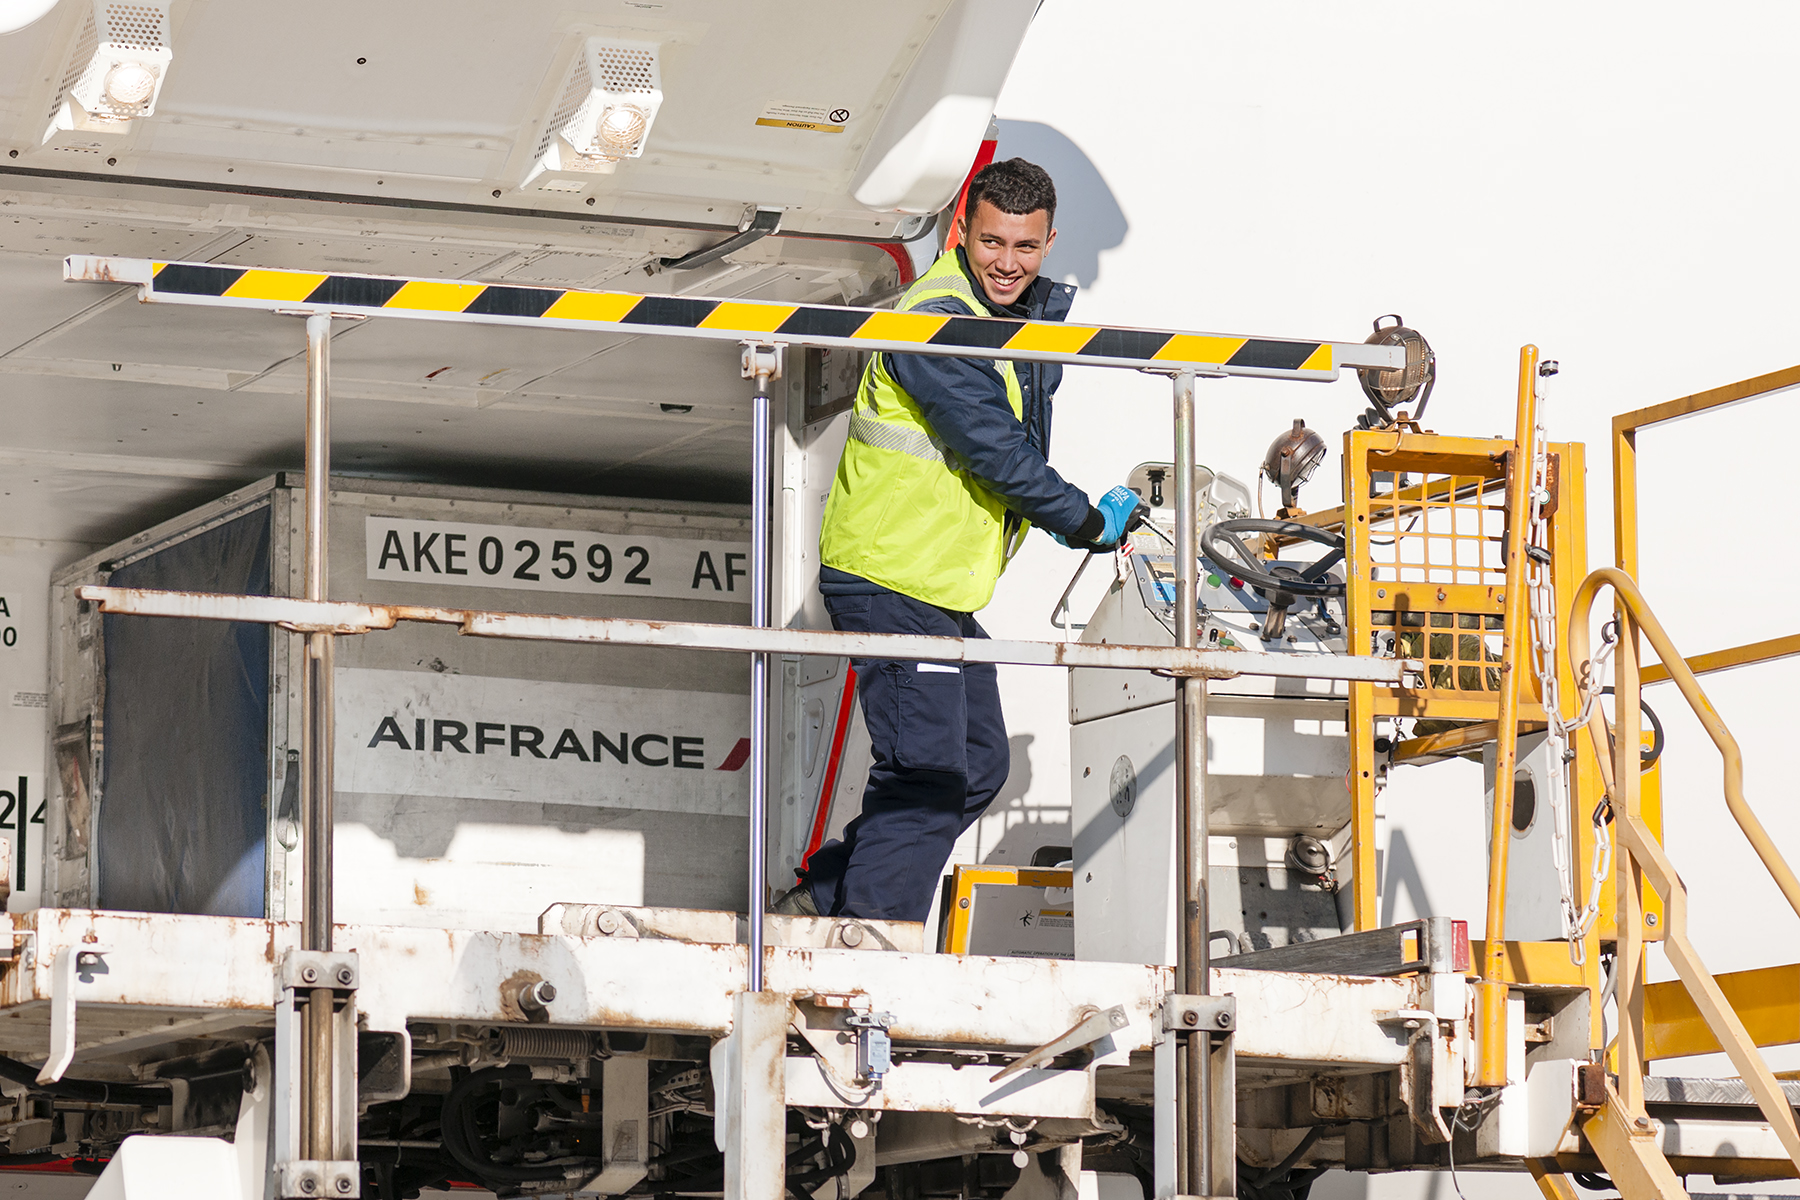 Air France at Work 5.jpg